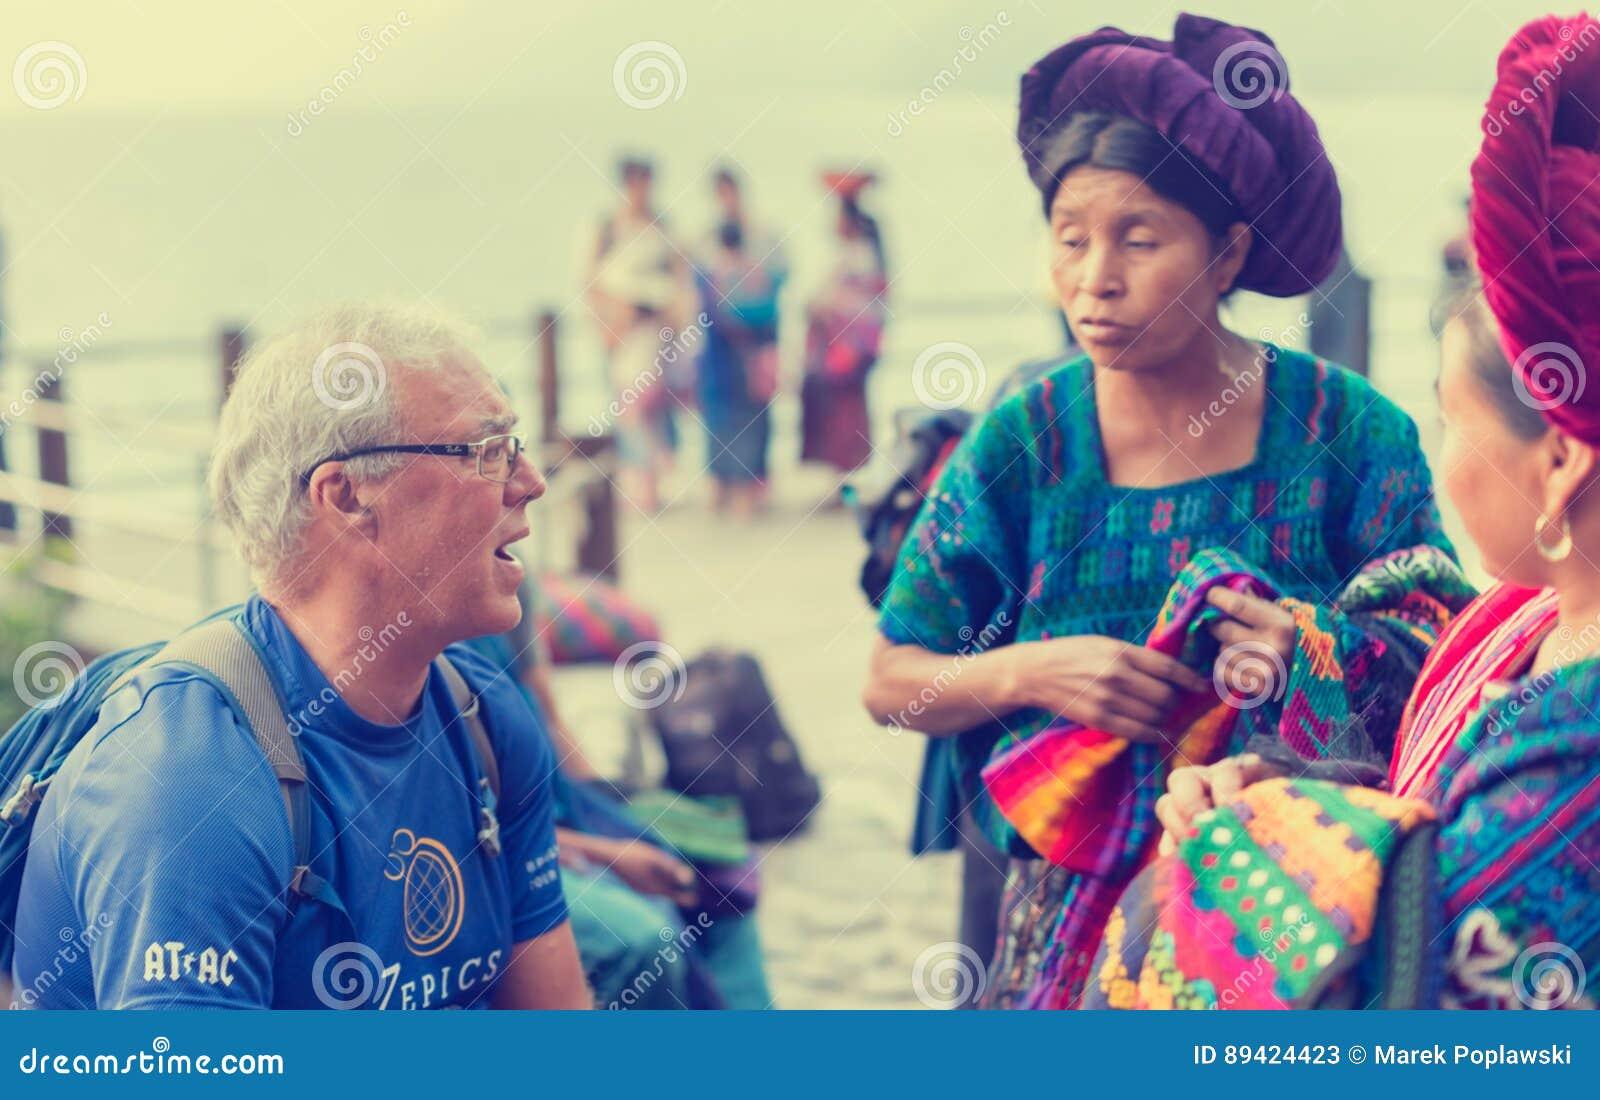 Vendedores ambulantes na cidade ocupada do turista de Panajachel, Guatemala